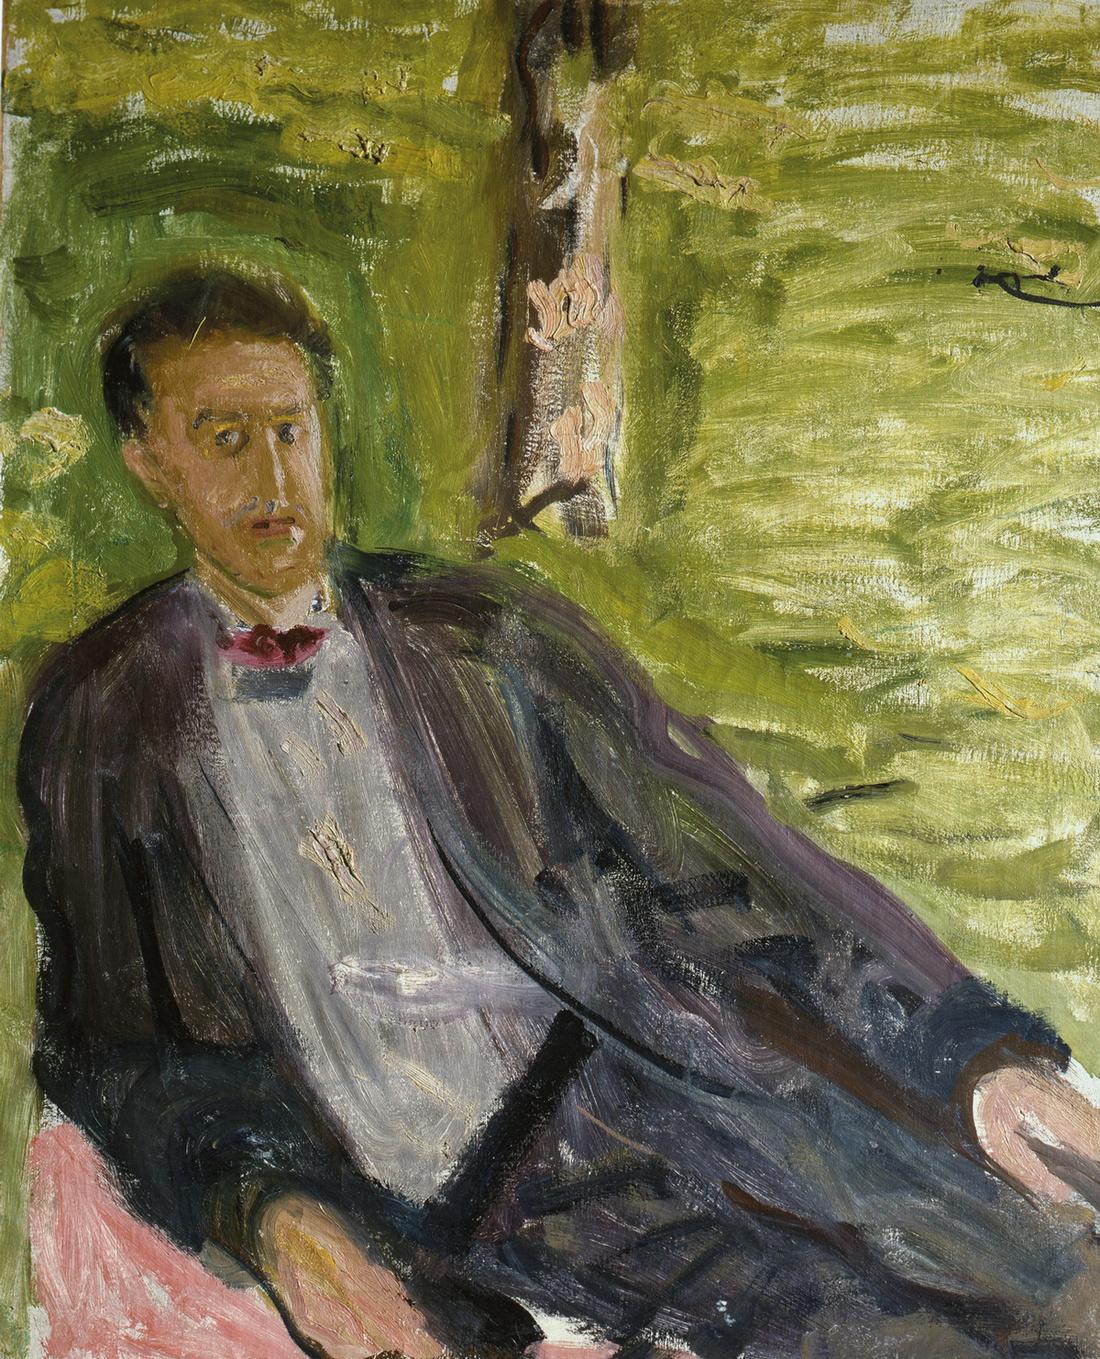 Gerstl, Portrait of a Man (Green background), 1908.